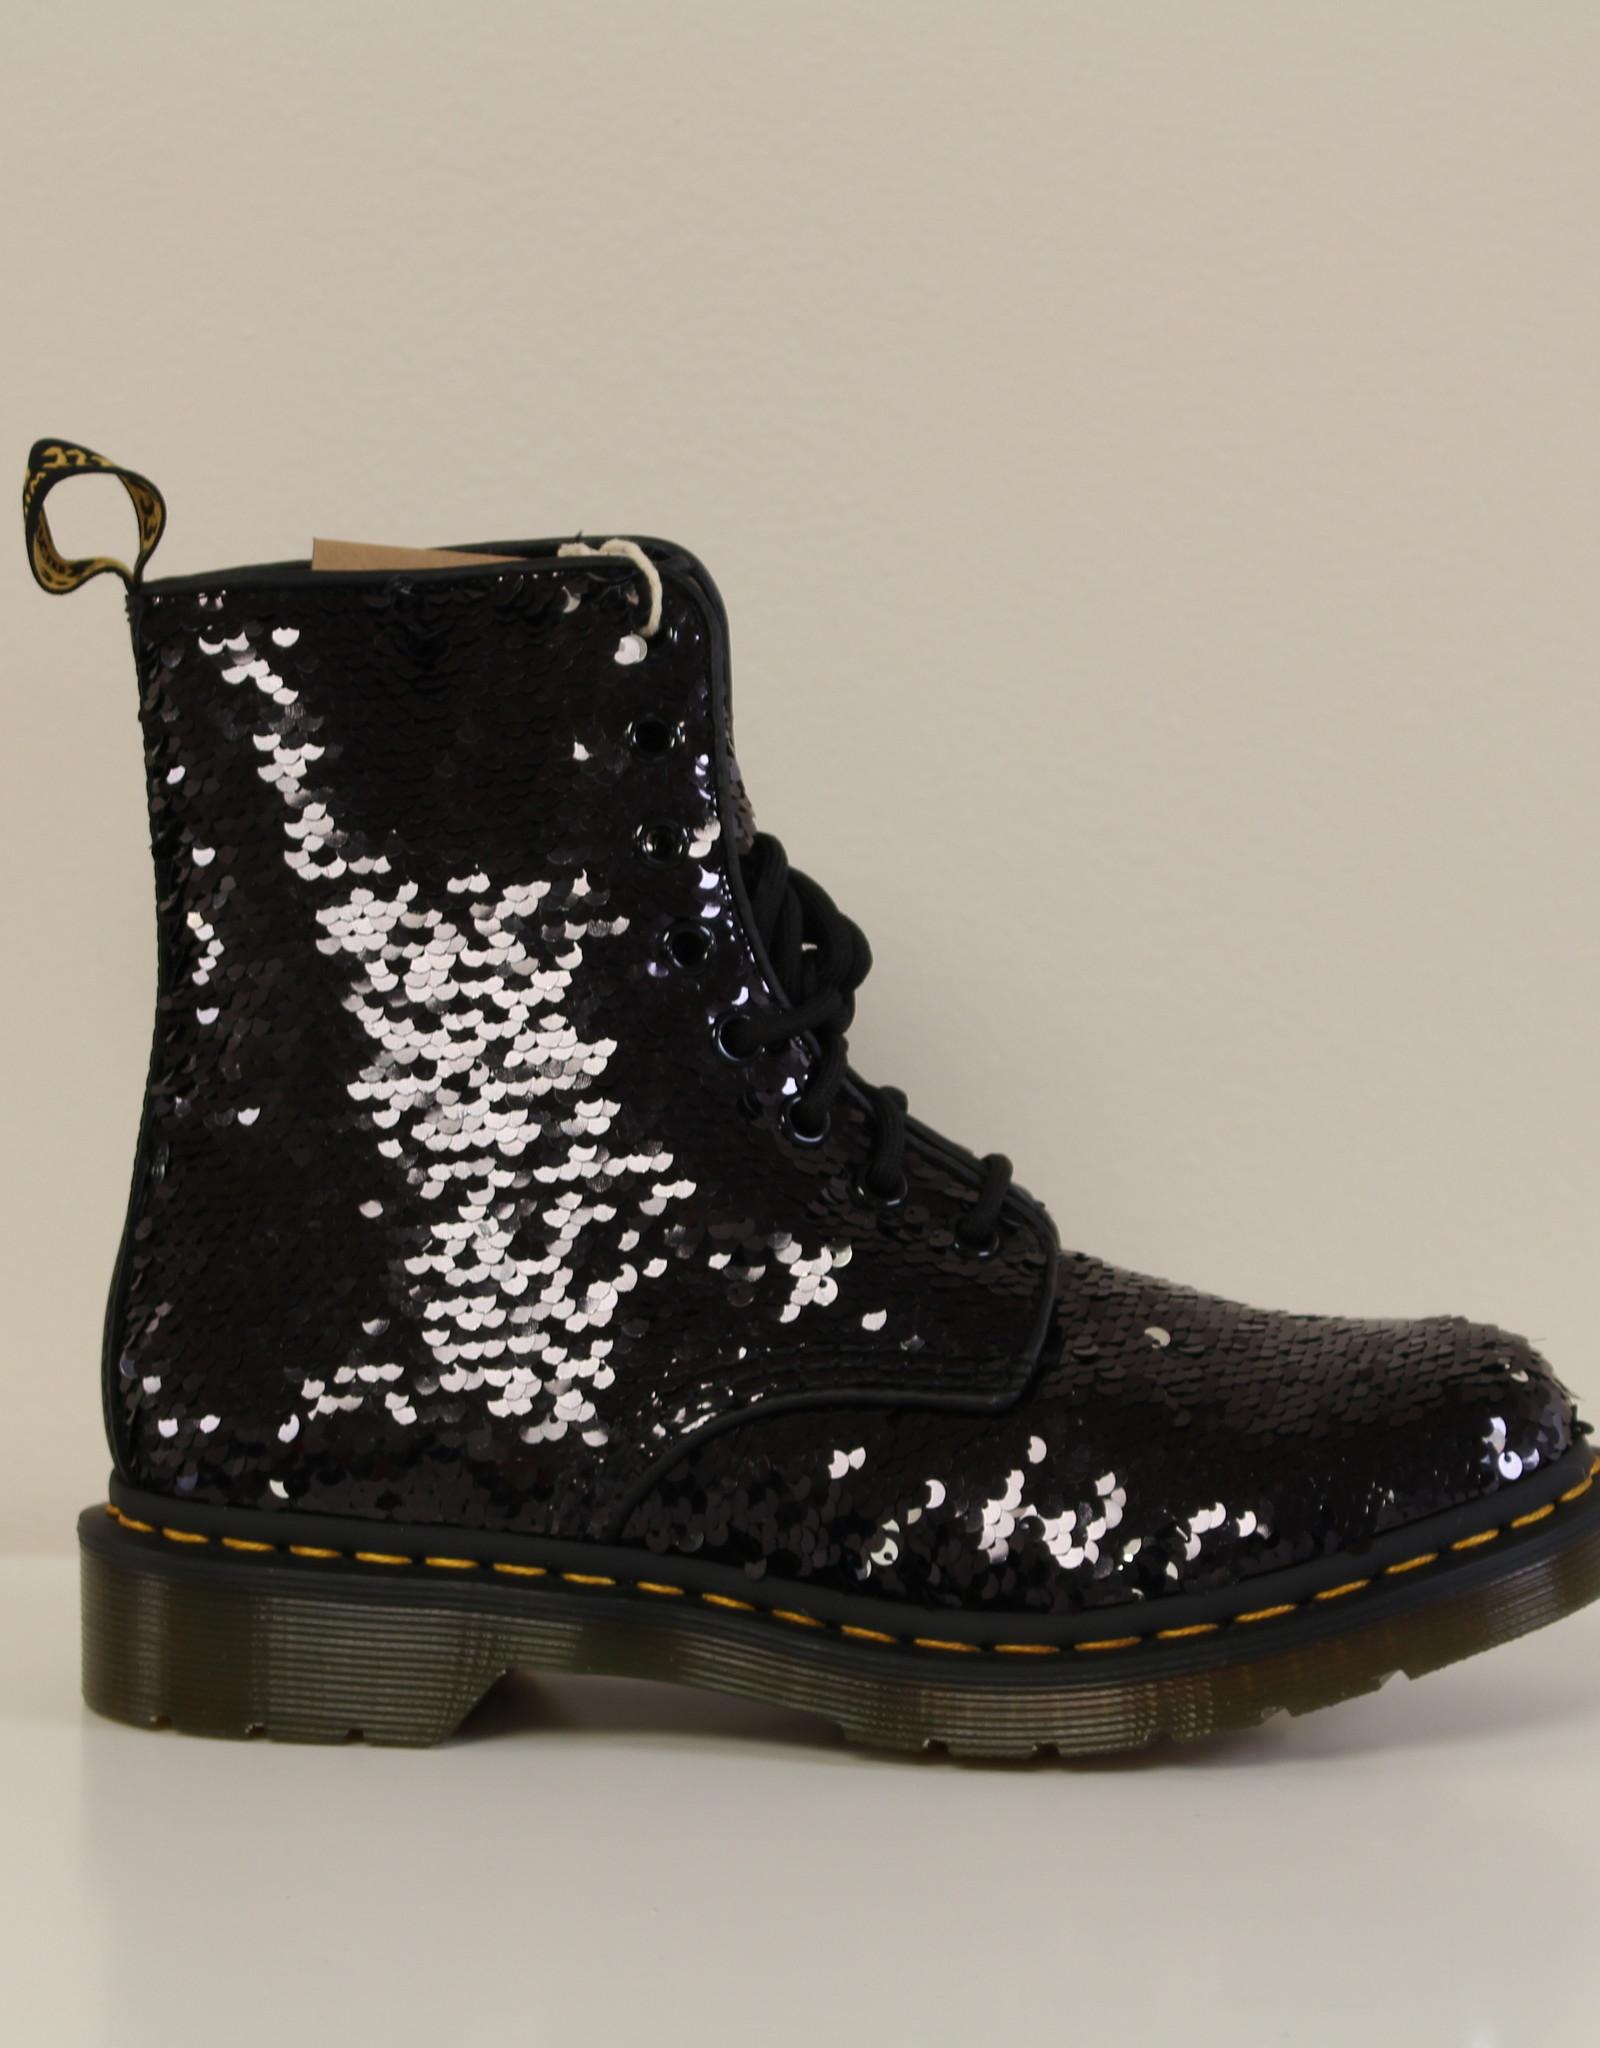 Dr Martens 1460 Pascal black sequin + hydro